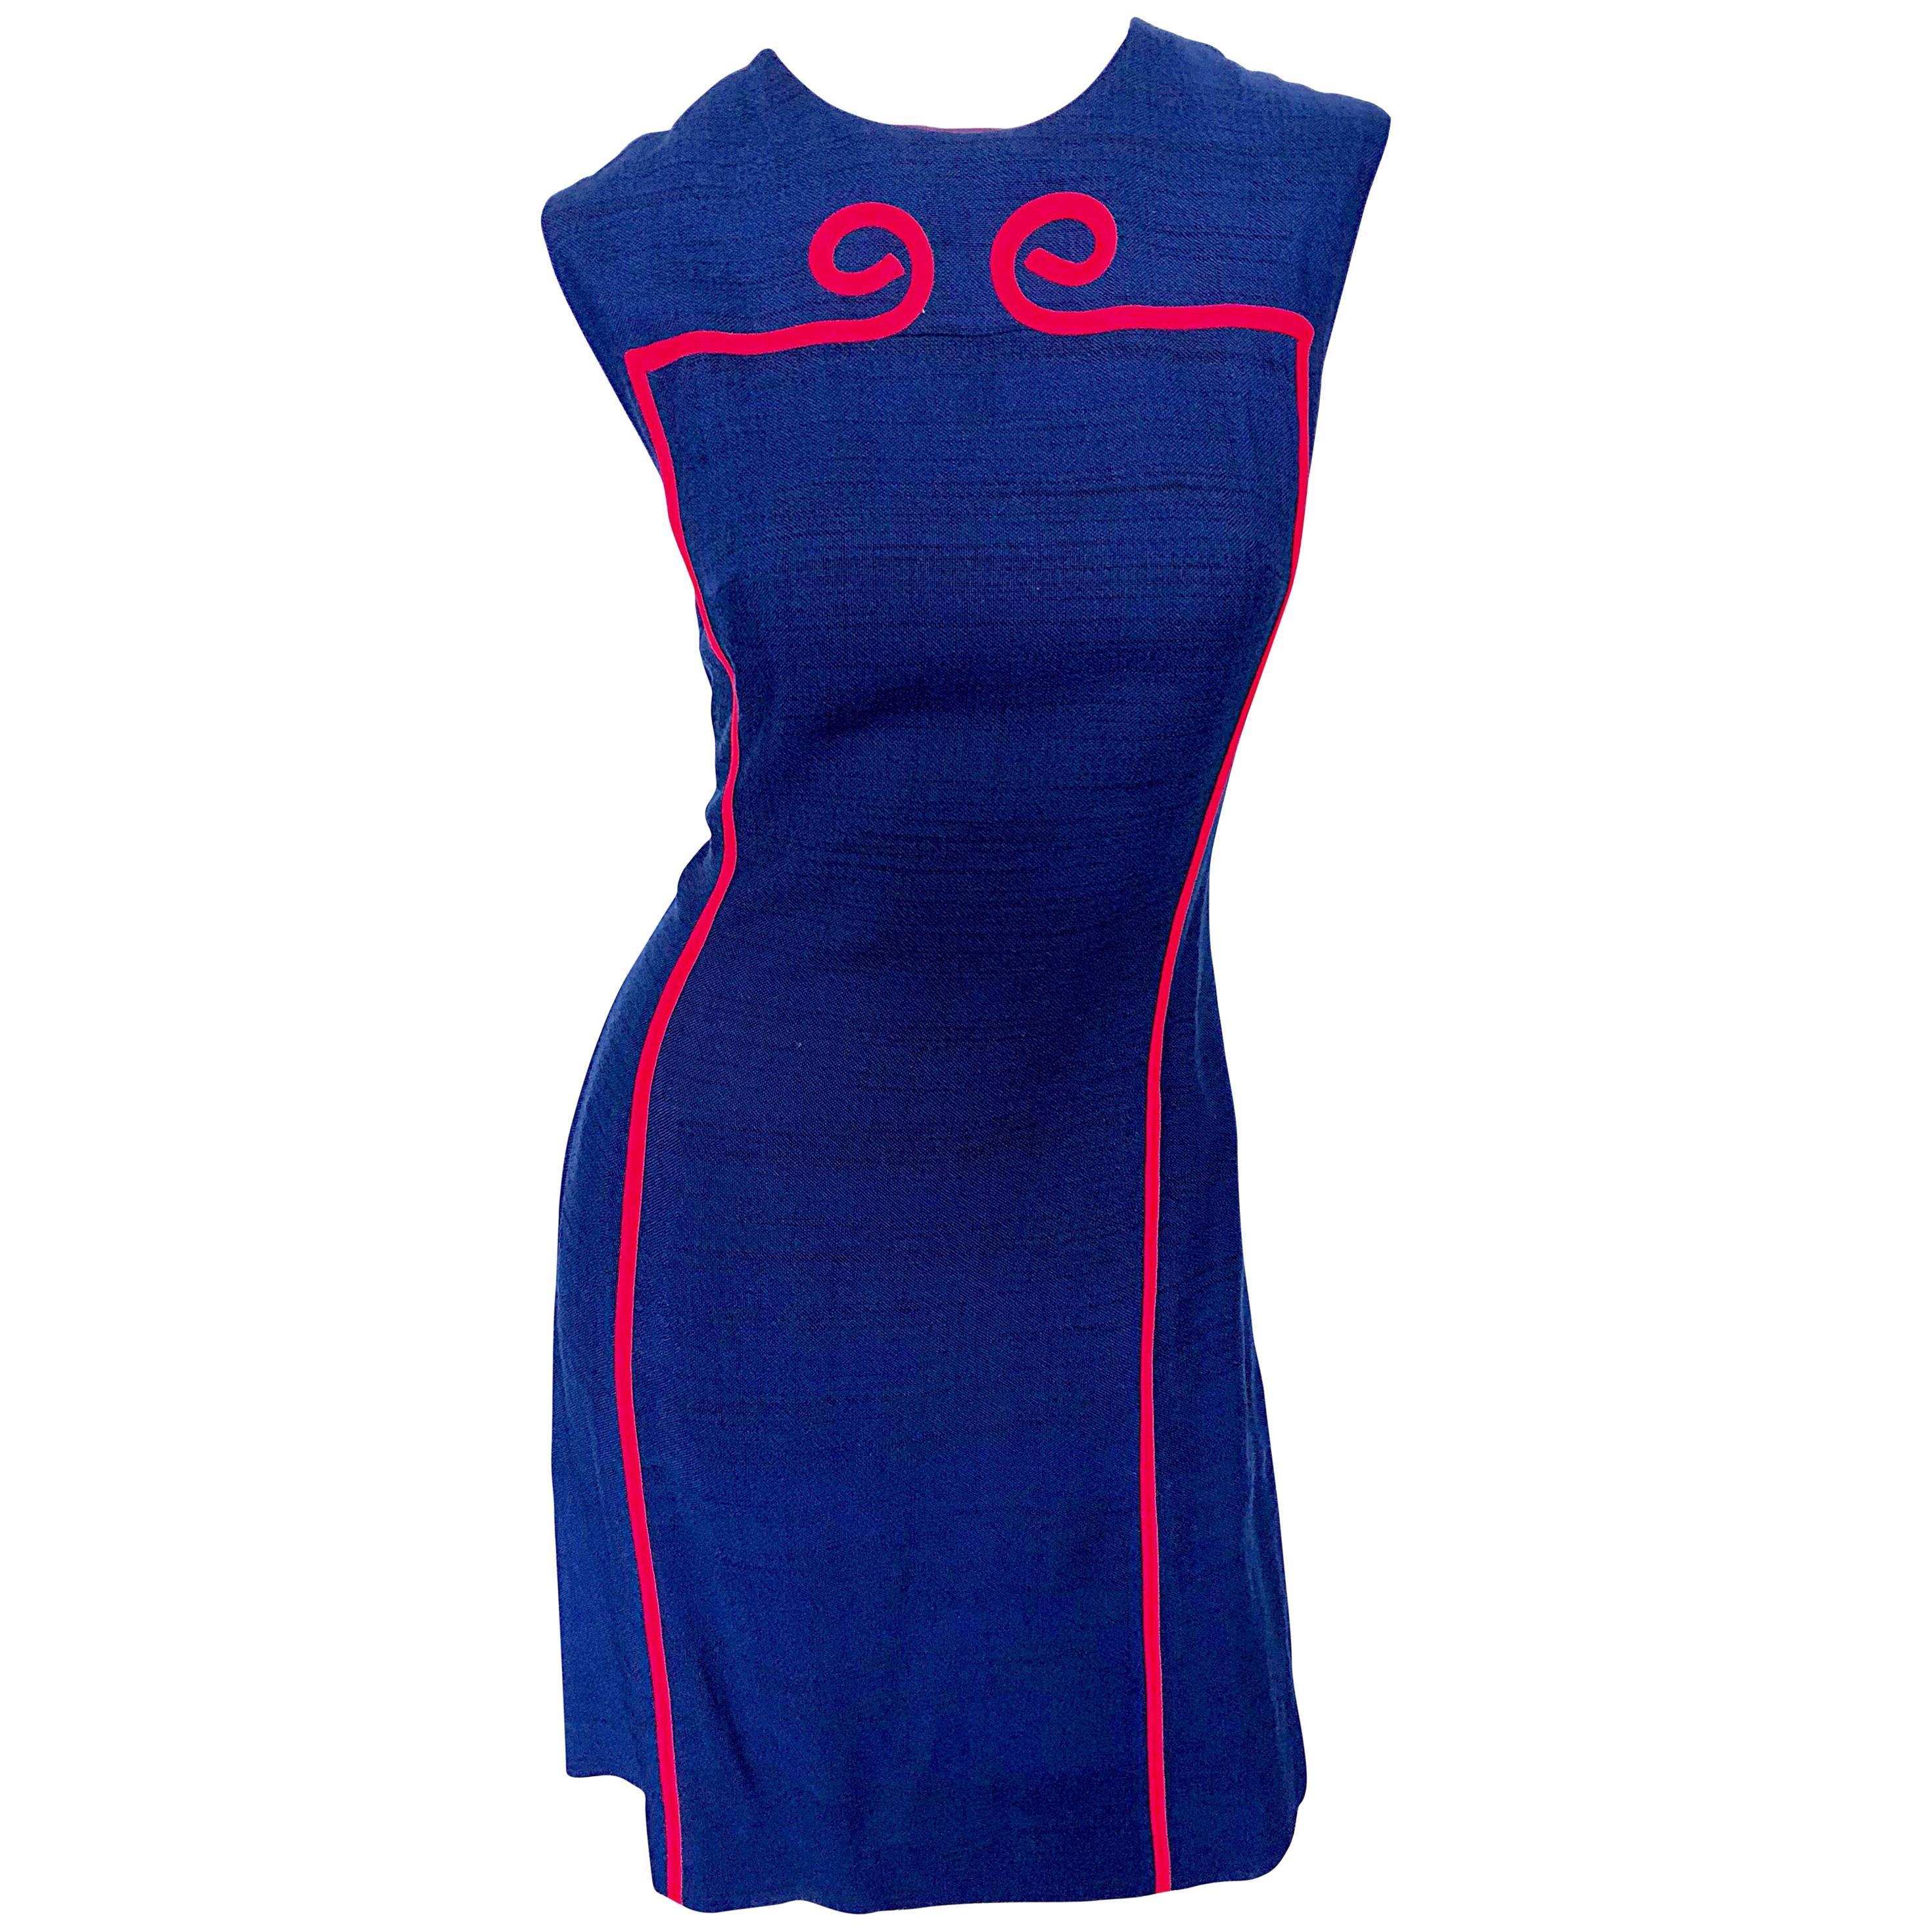 Joseph Magnin 1960s Navy Blue + Red Linen Silk Nautical Vintage 60s Shift Dress